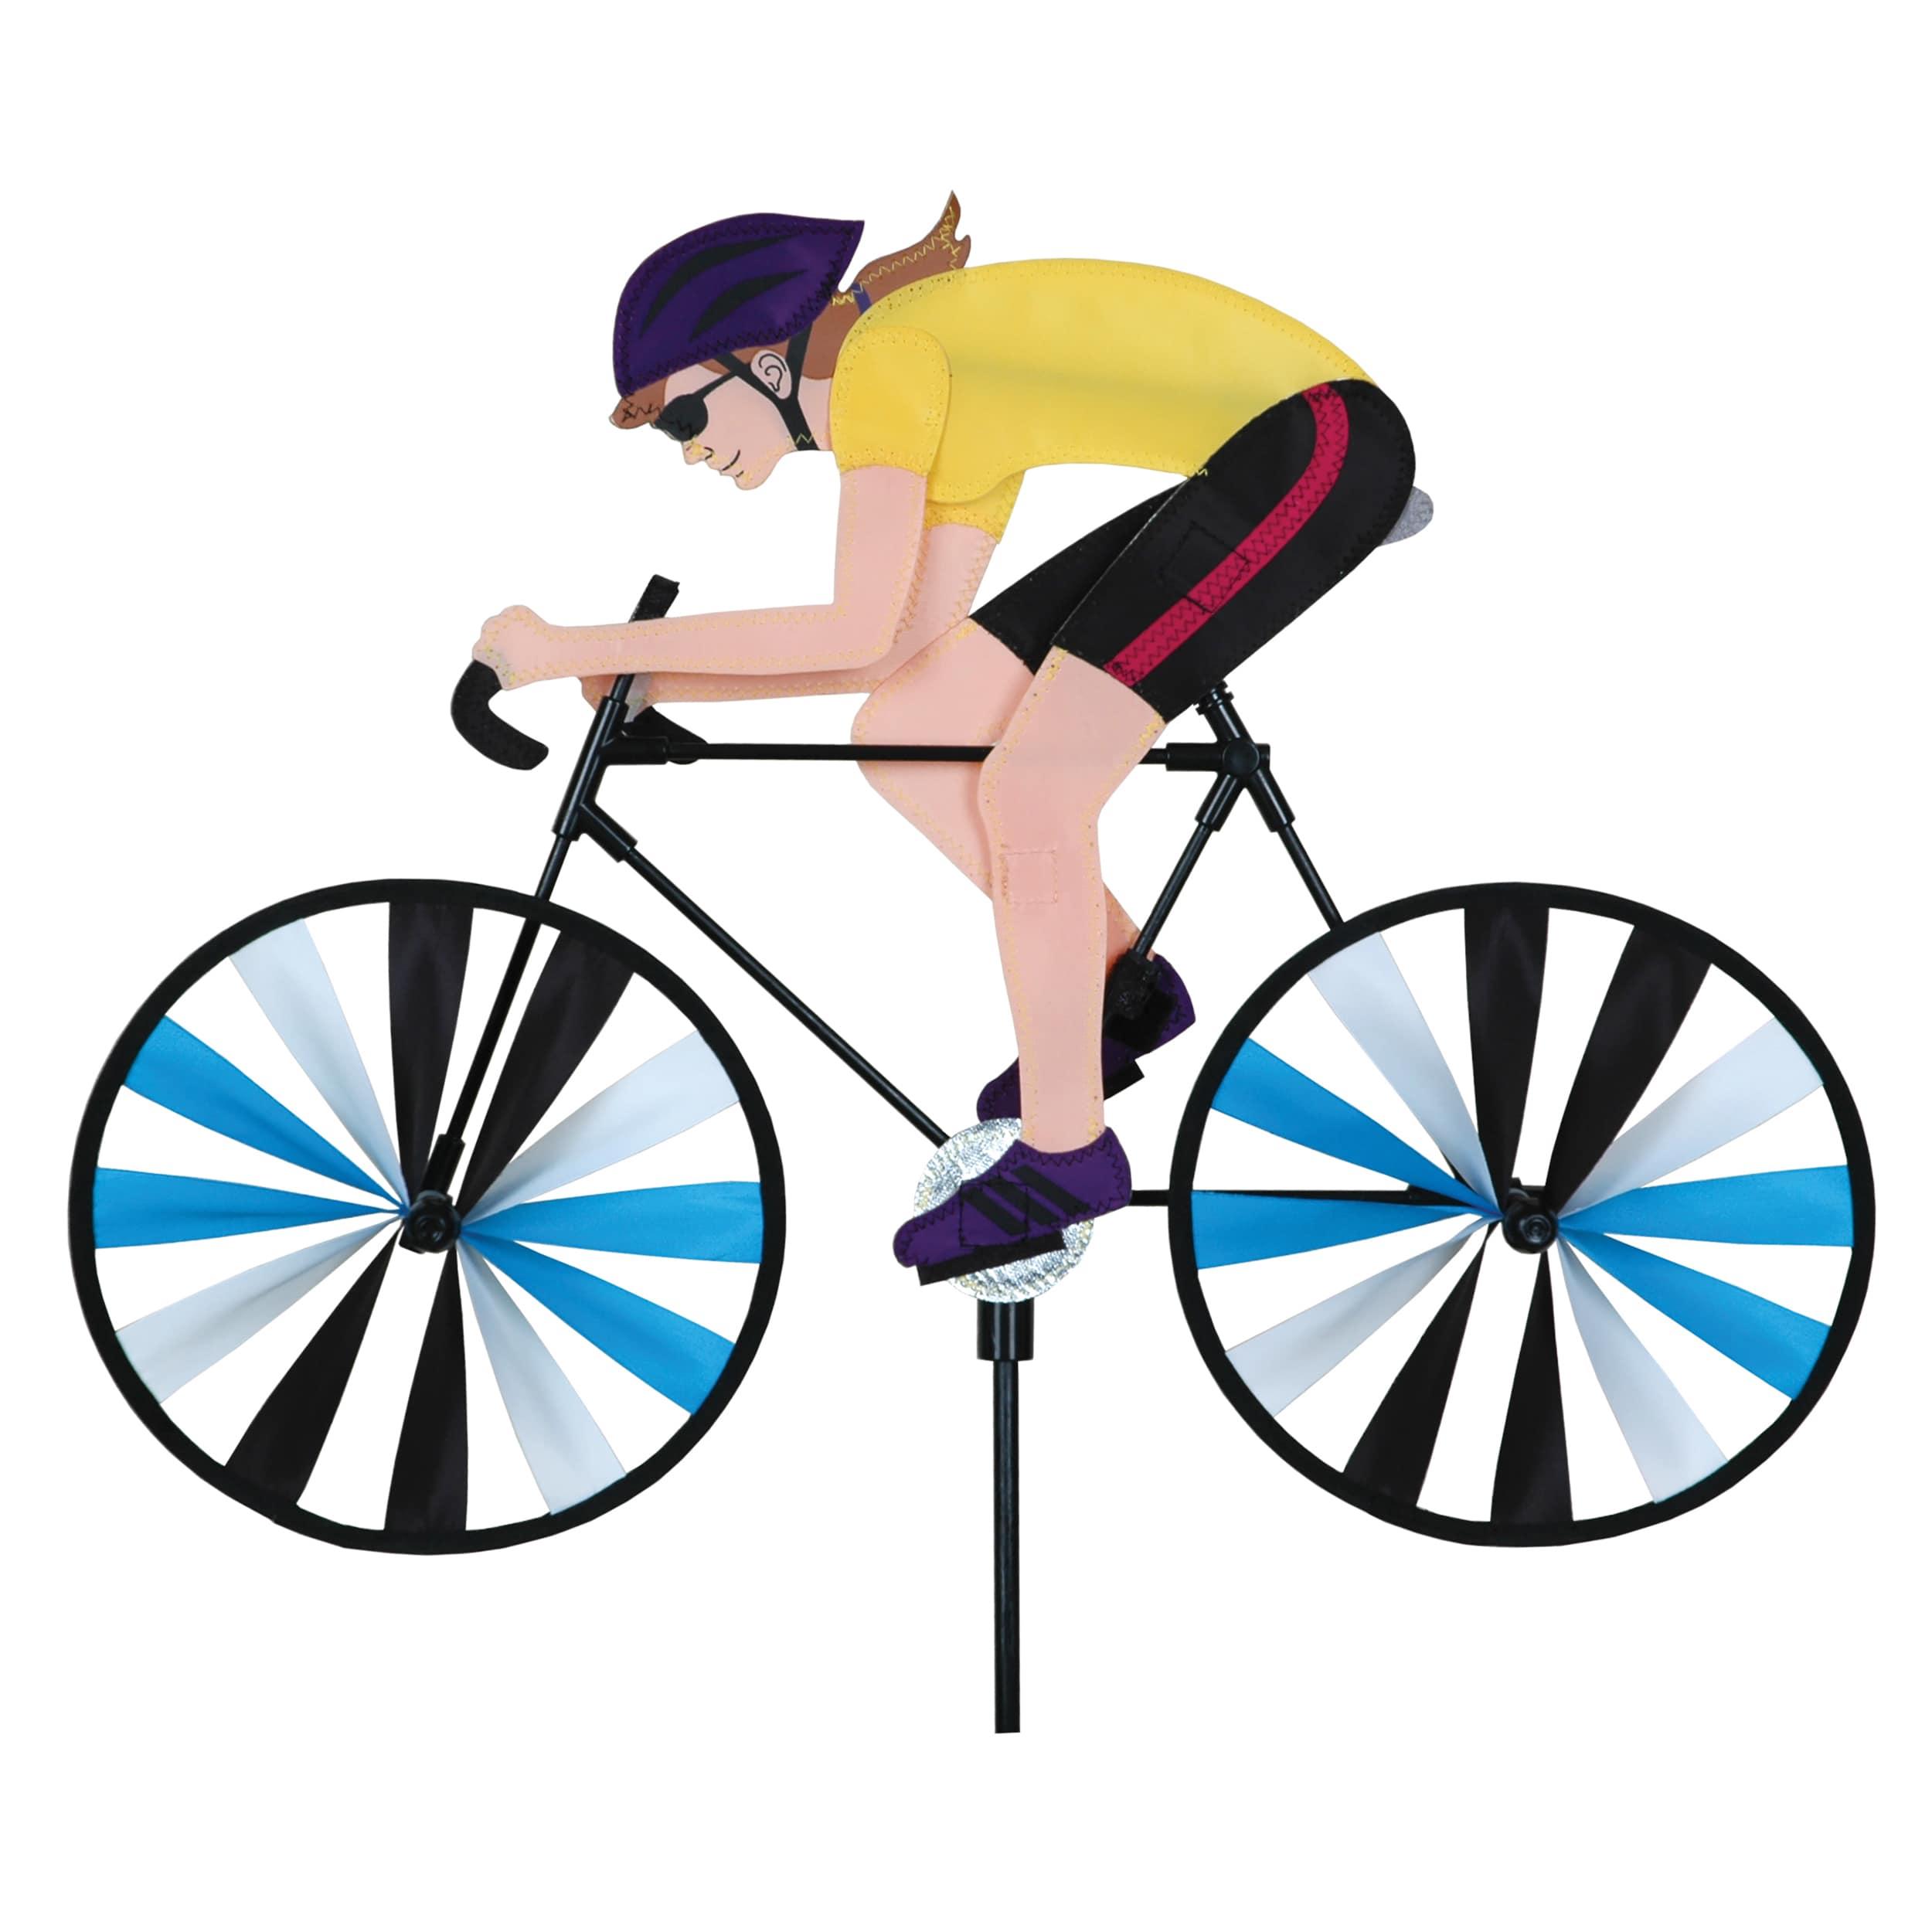 "Premier Designs 22"" Road Bike Spinner, Lady"